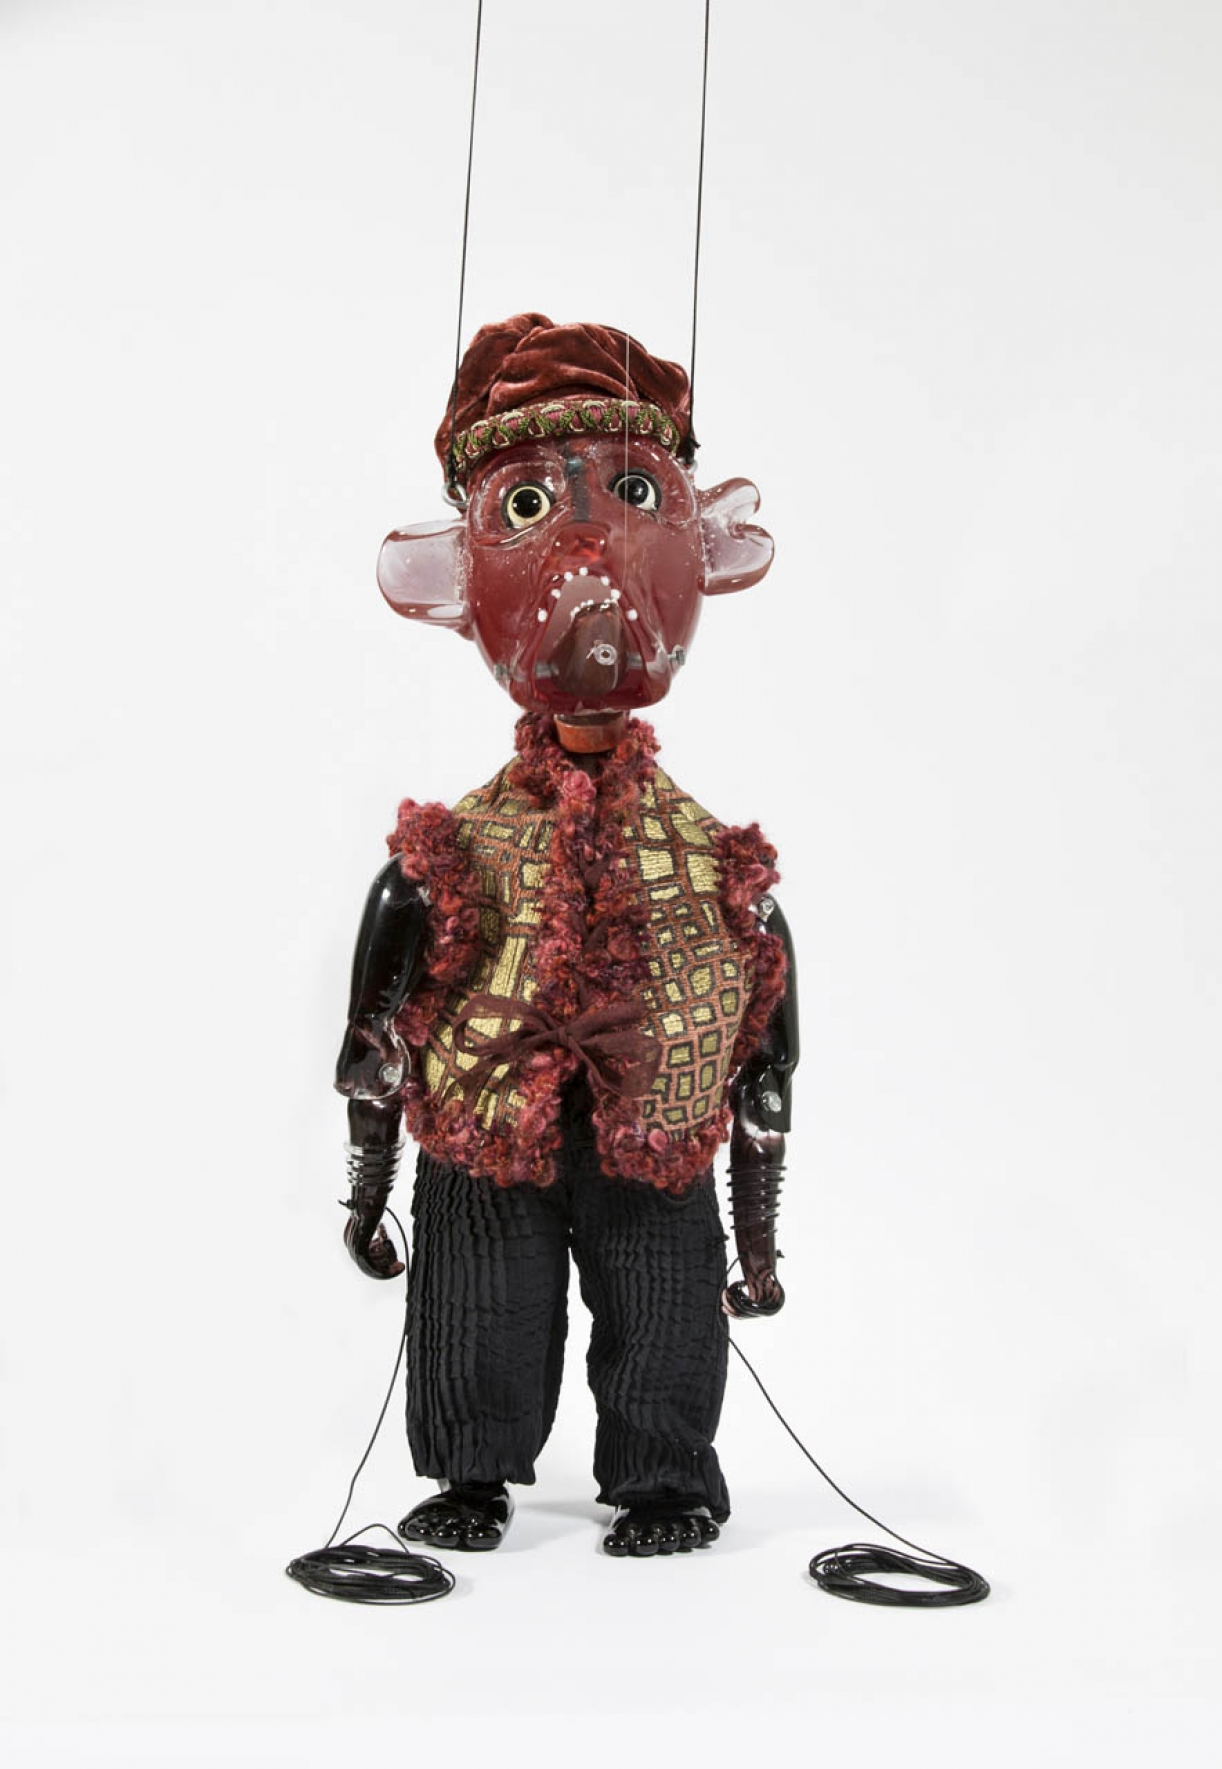 Cabaret Crusades: The Secrets of Karbalaa, Marionette (Mujeer al-Din Abaq), Glass, fabric, enamel, thread, 43 x 16 x 13 cm